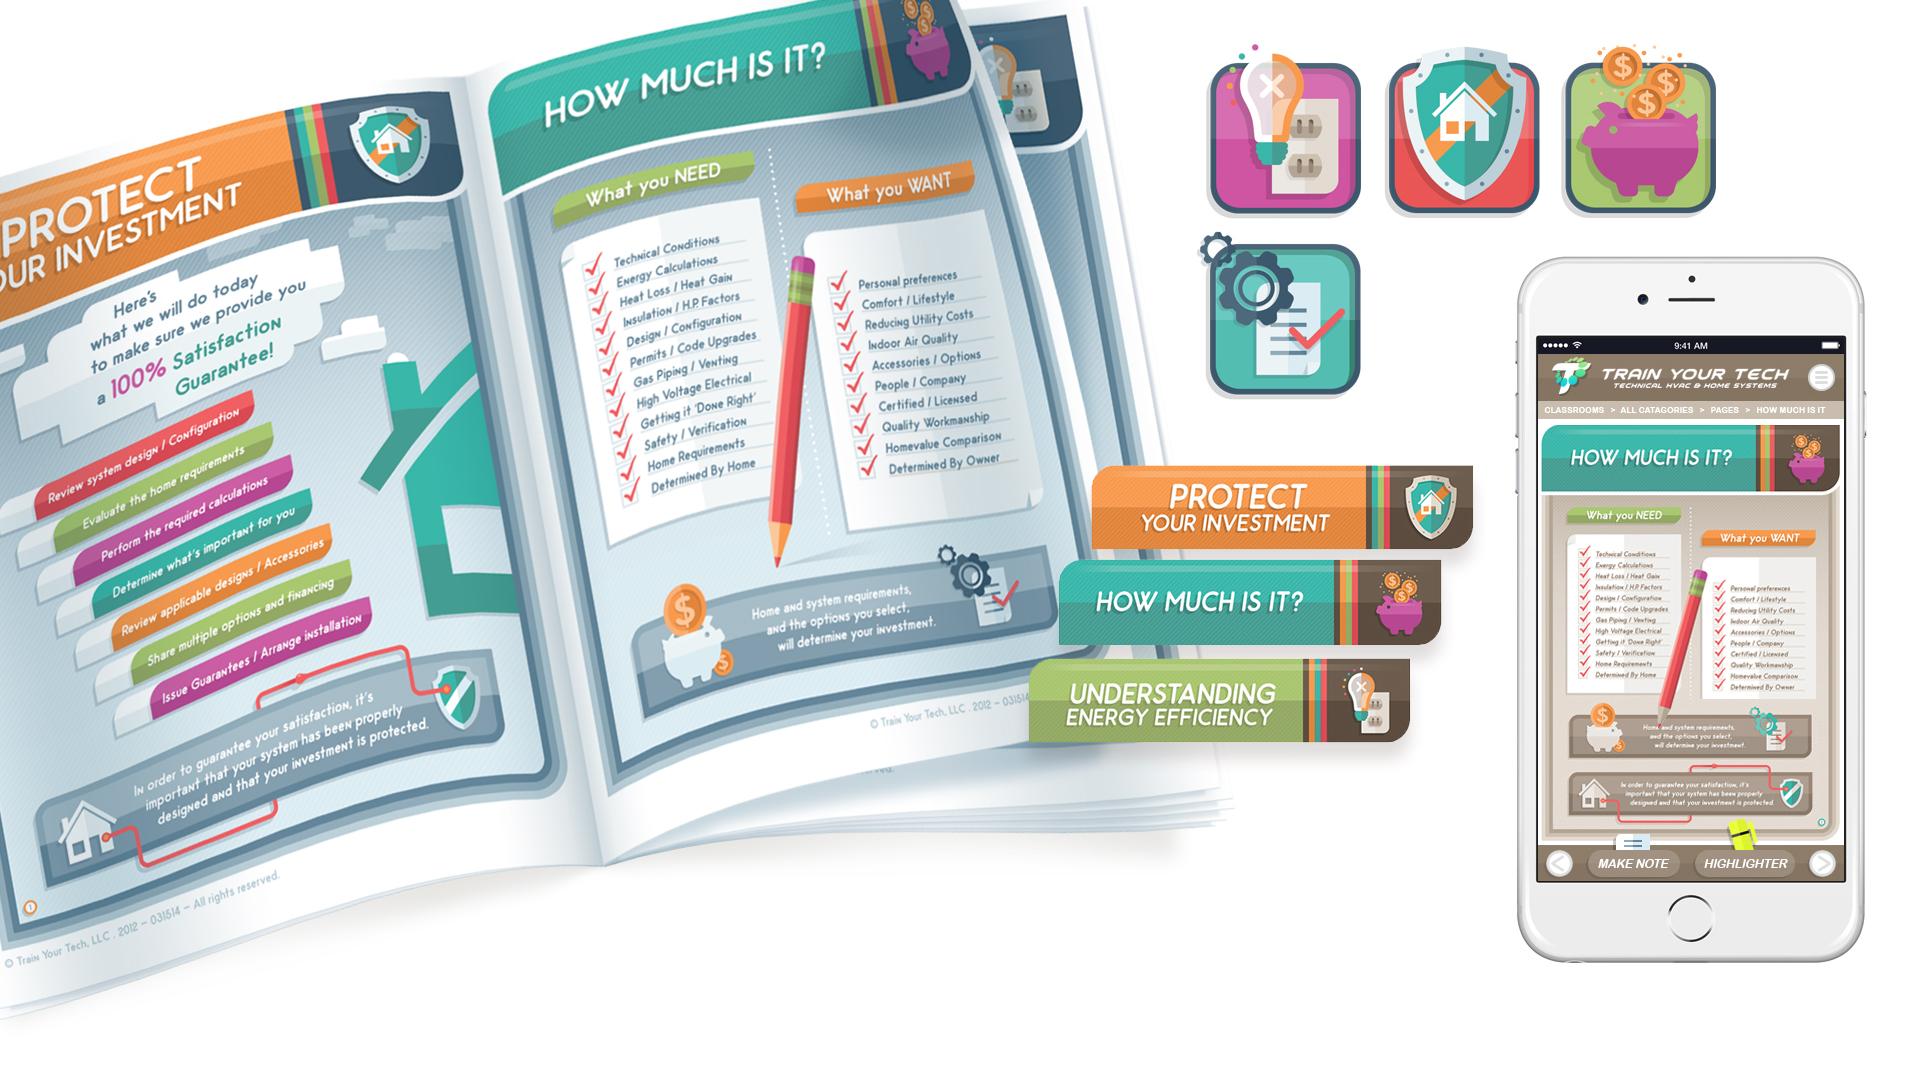 TYT_Book_App.jpg